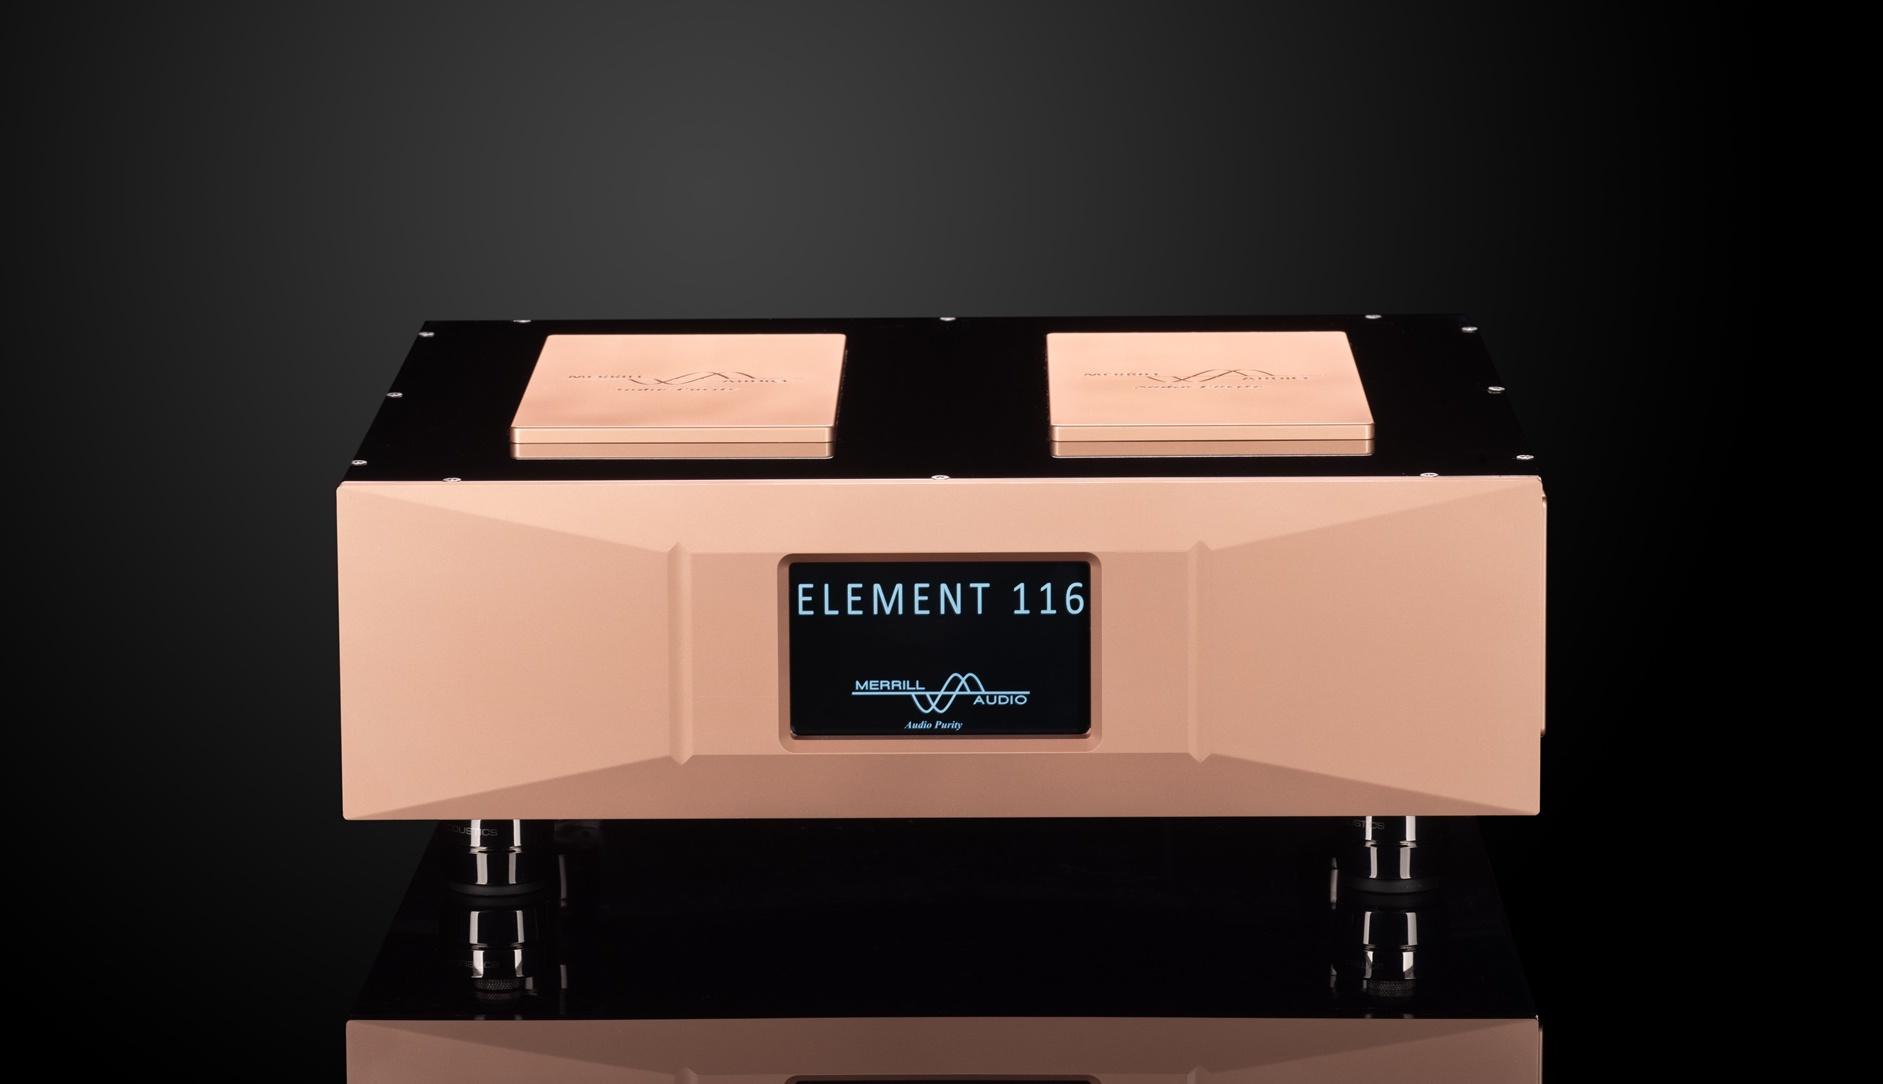 Introducing the Merrill Audio Element 116